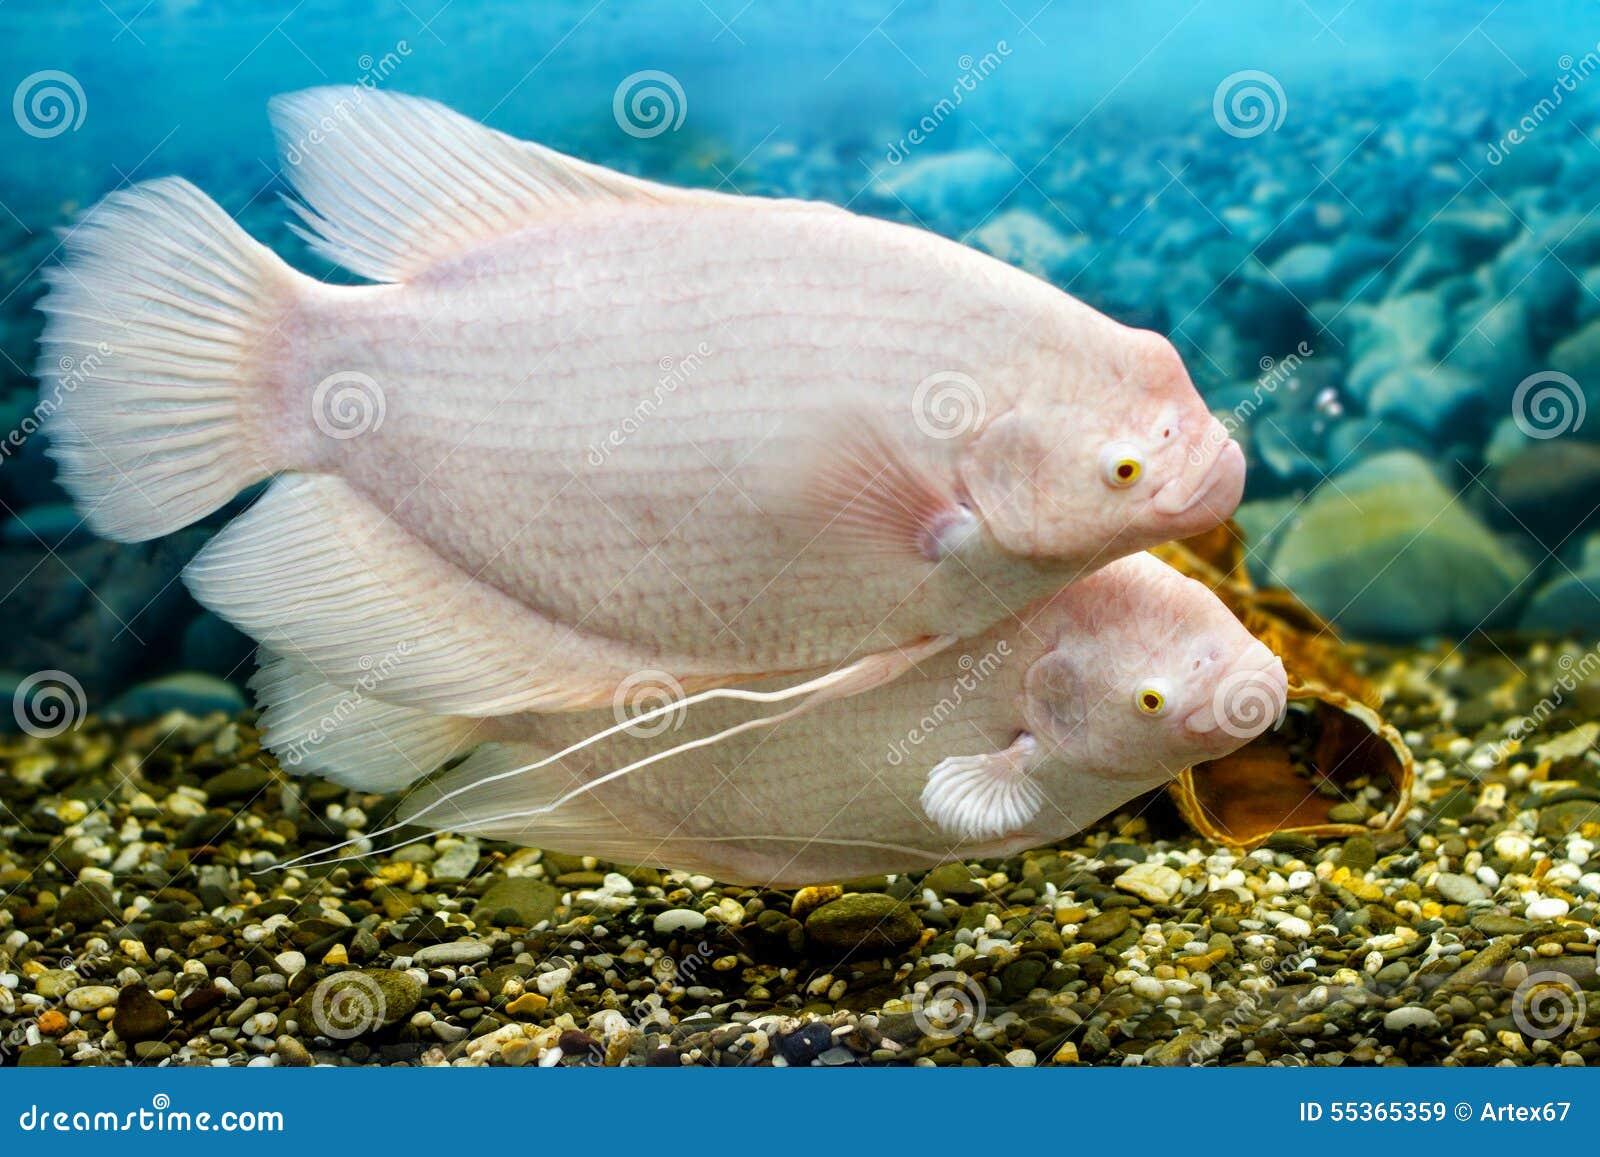 Fish in big aquarium - Big Fish In The Aquarium Gourami Fishing